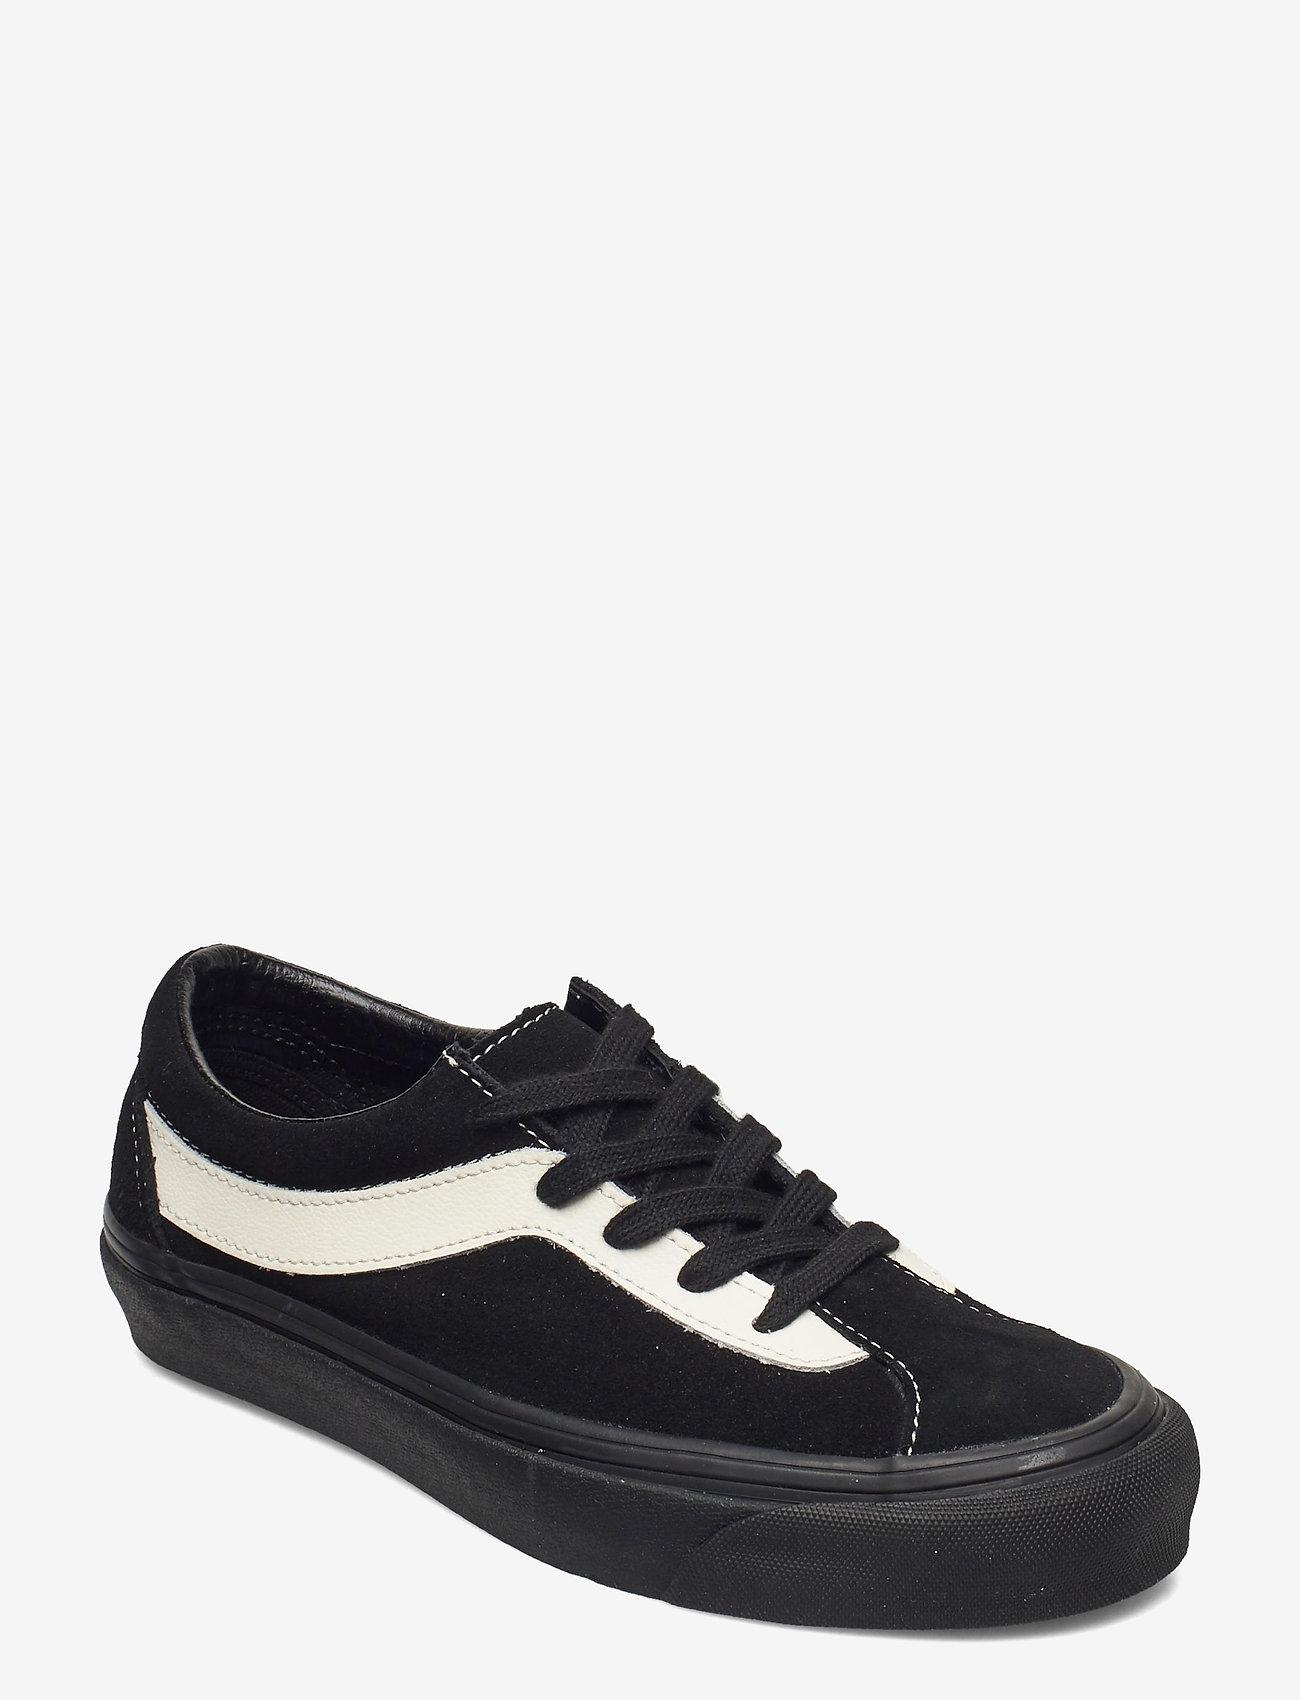 VANS - UA Bold NI - laag sneakers - (suede) black/marshmallow - 0